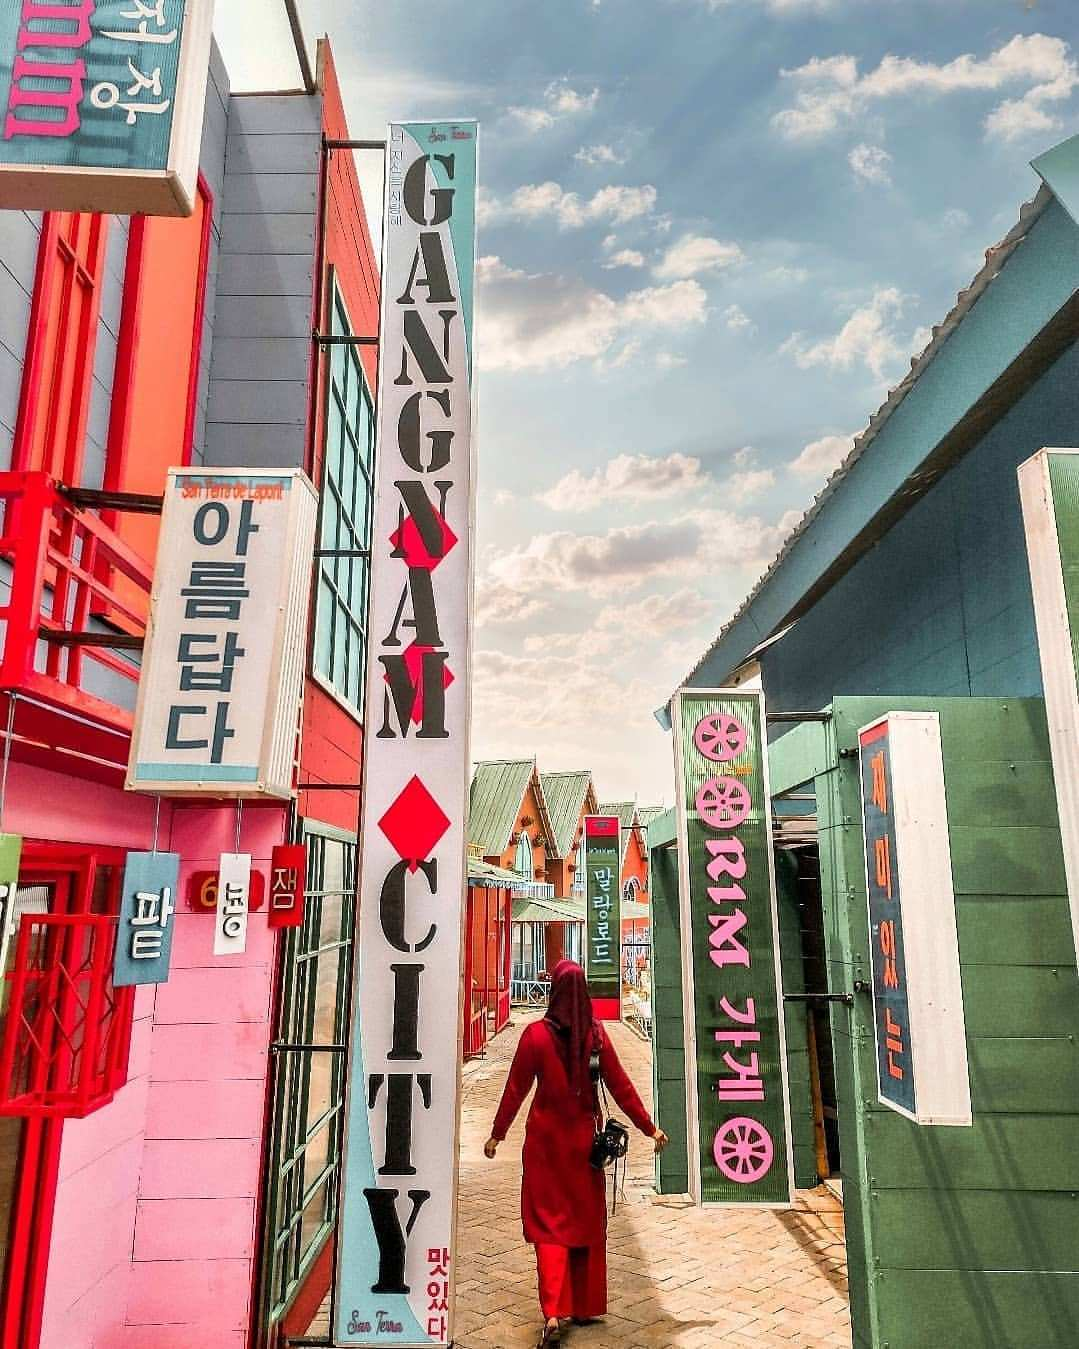 Bangunan menyerupai kota di korea, lokasi Florawisata San Terra, Image From @@citho_journeys